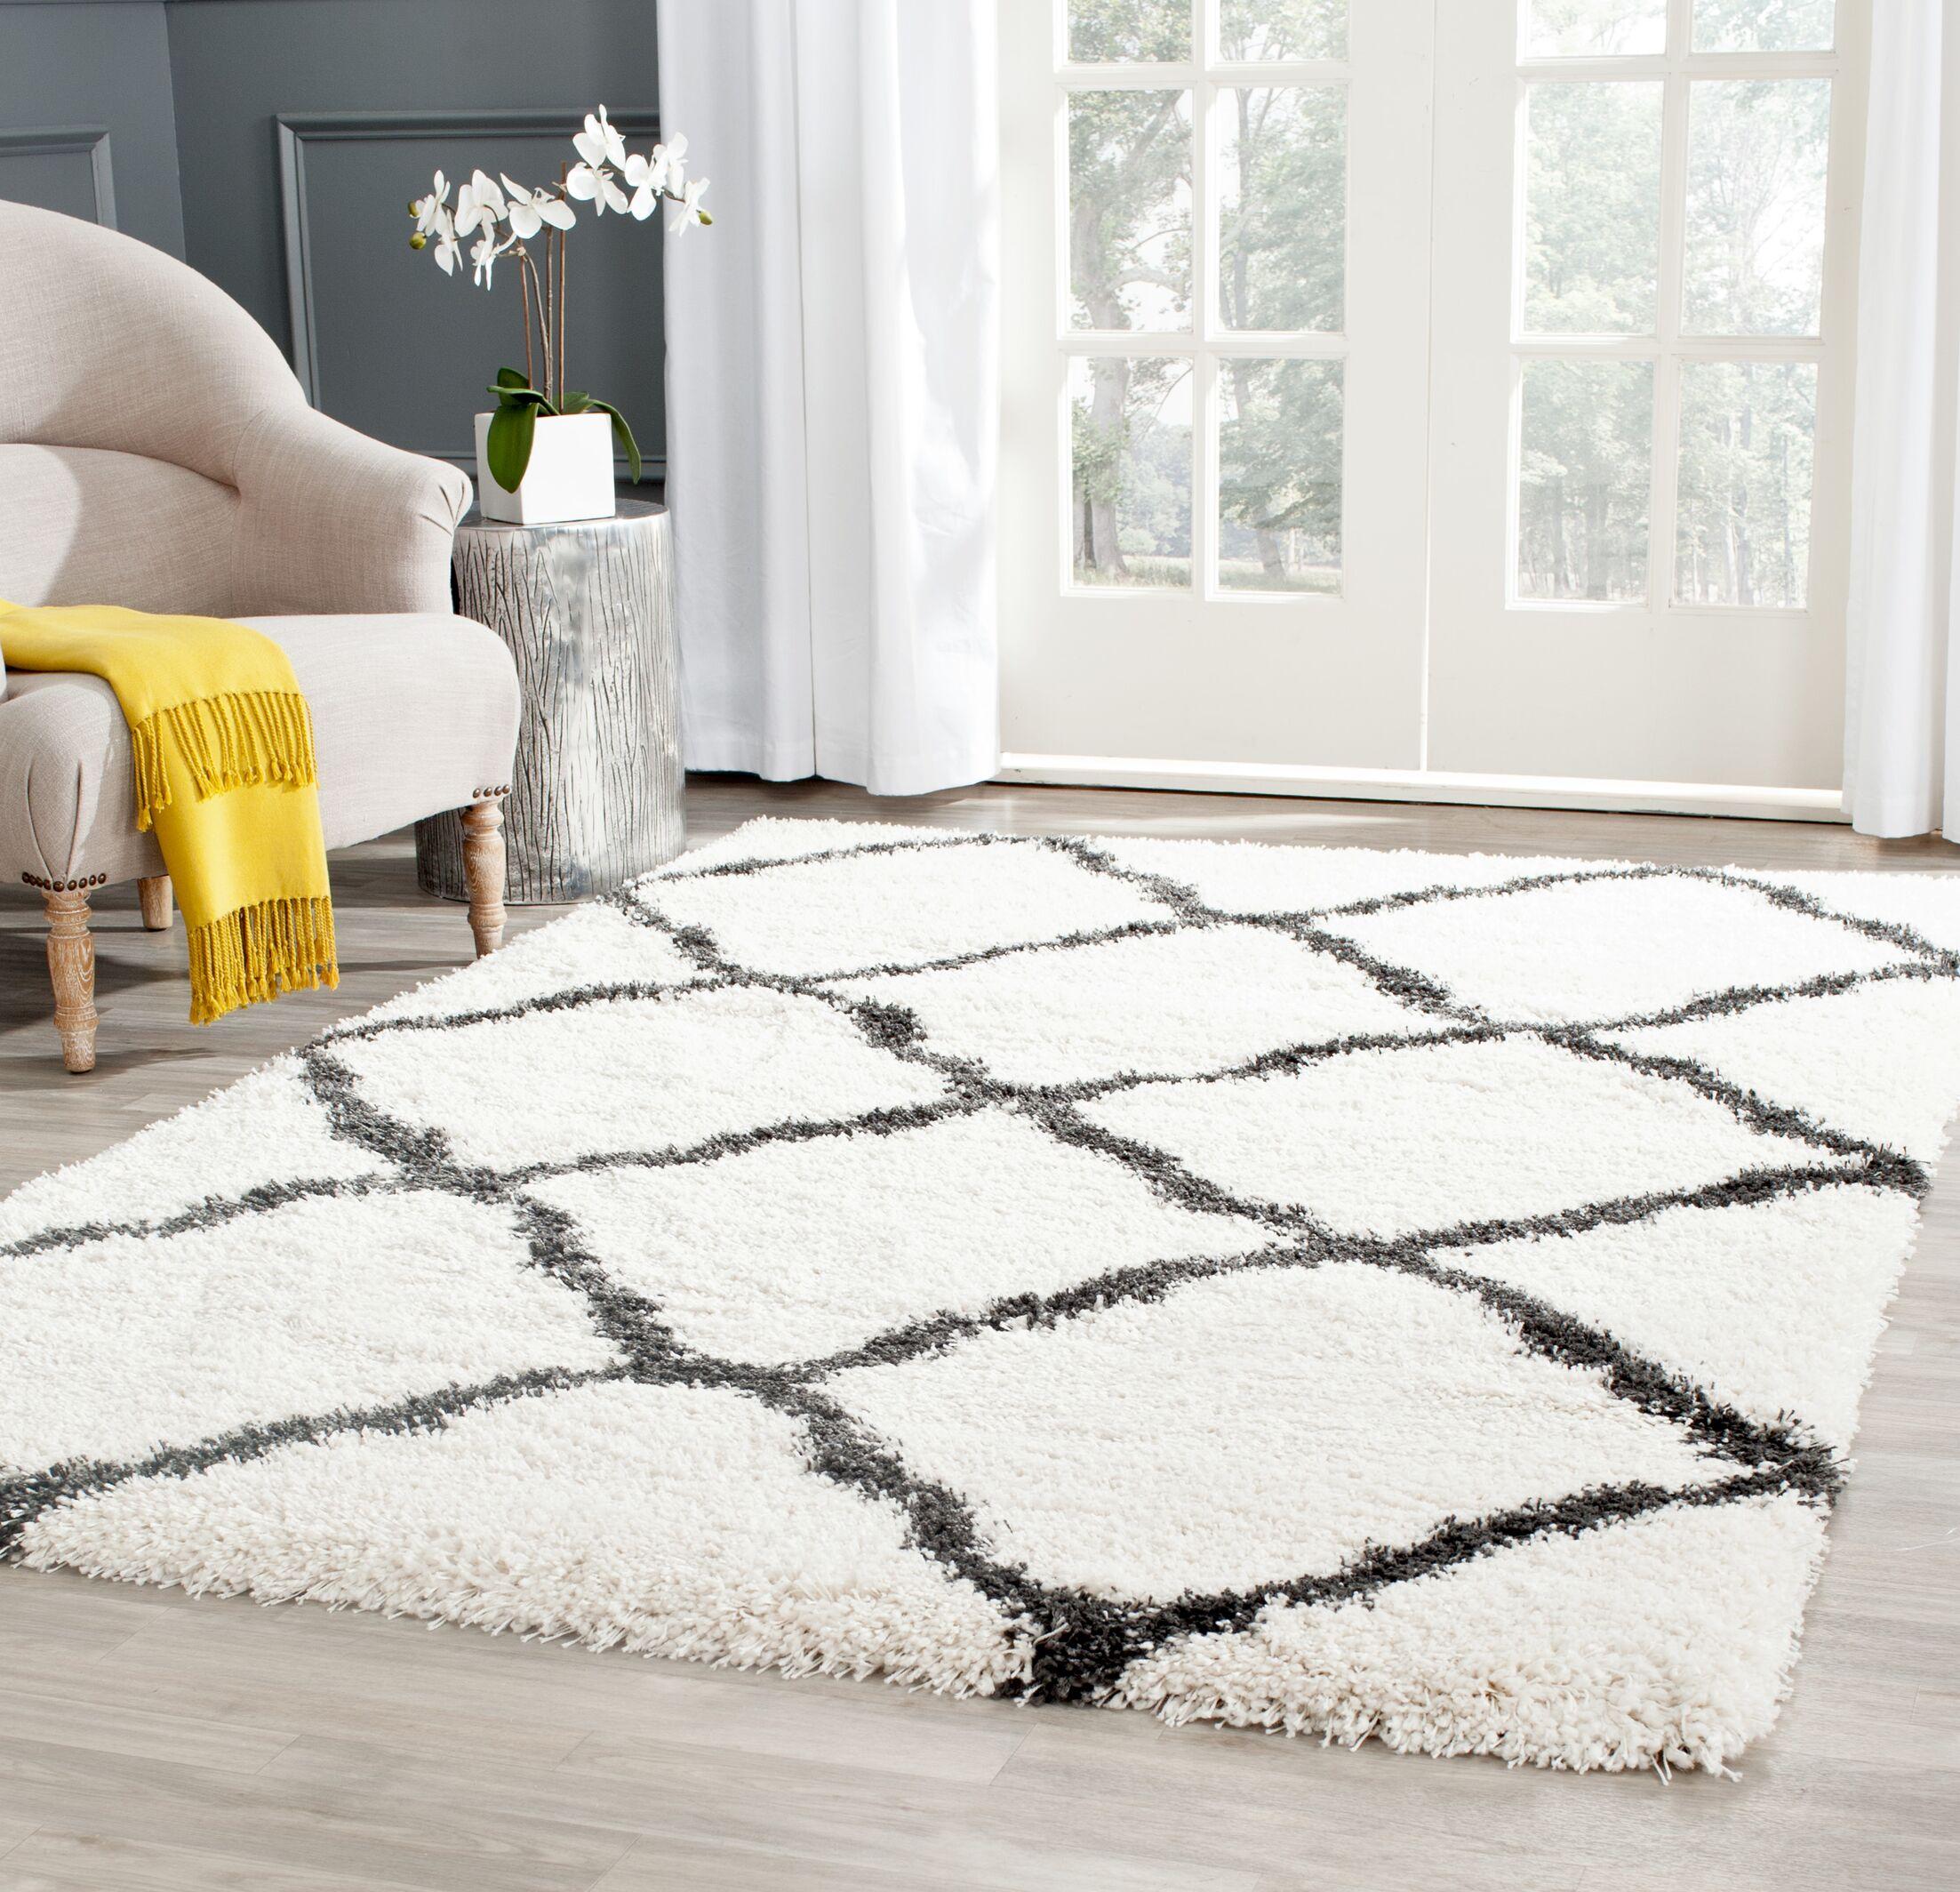 Charmain Ivory/Charcoal Area Rug Rug Size: Rectangle 5'1